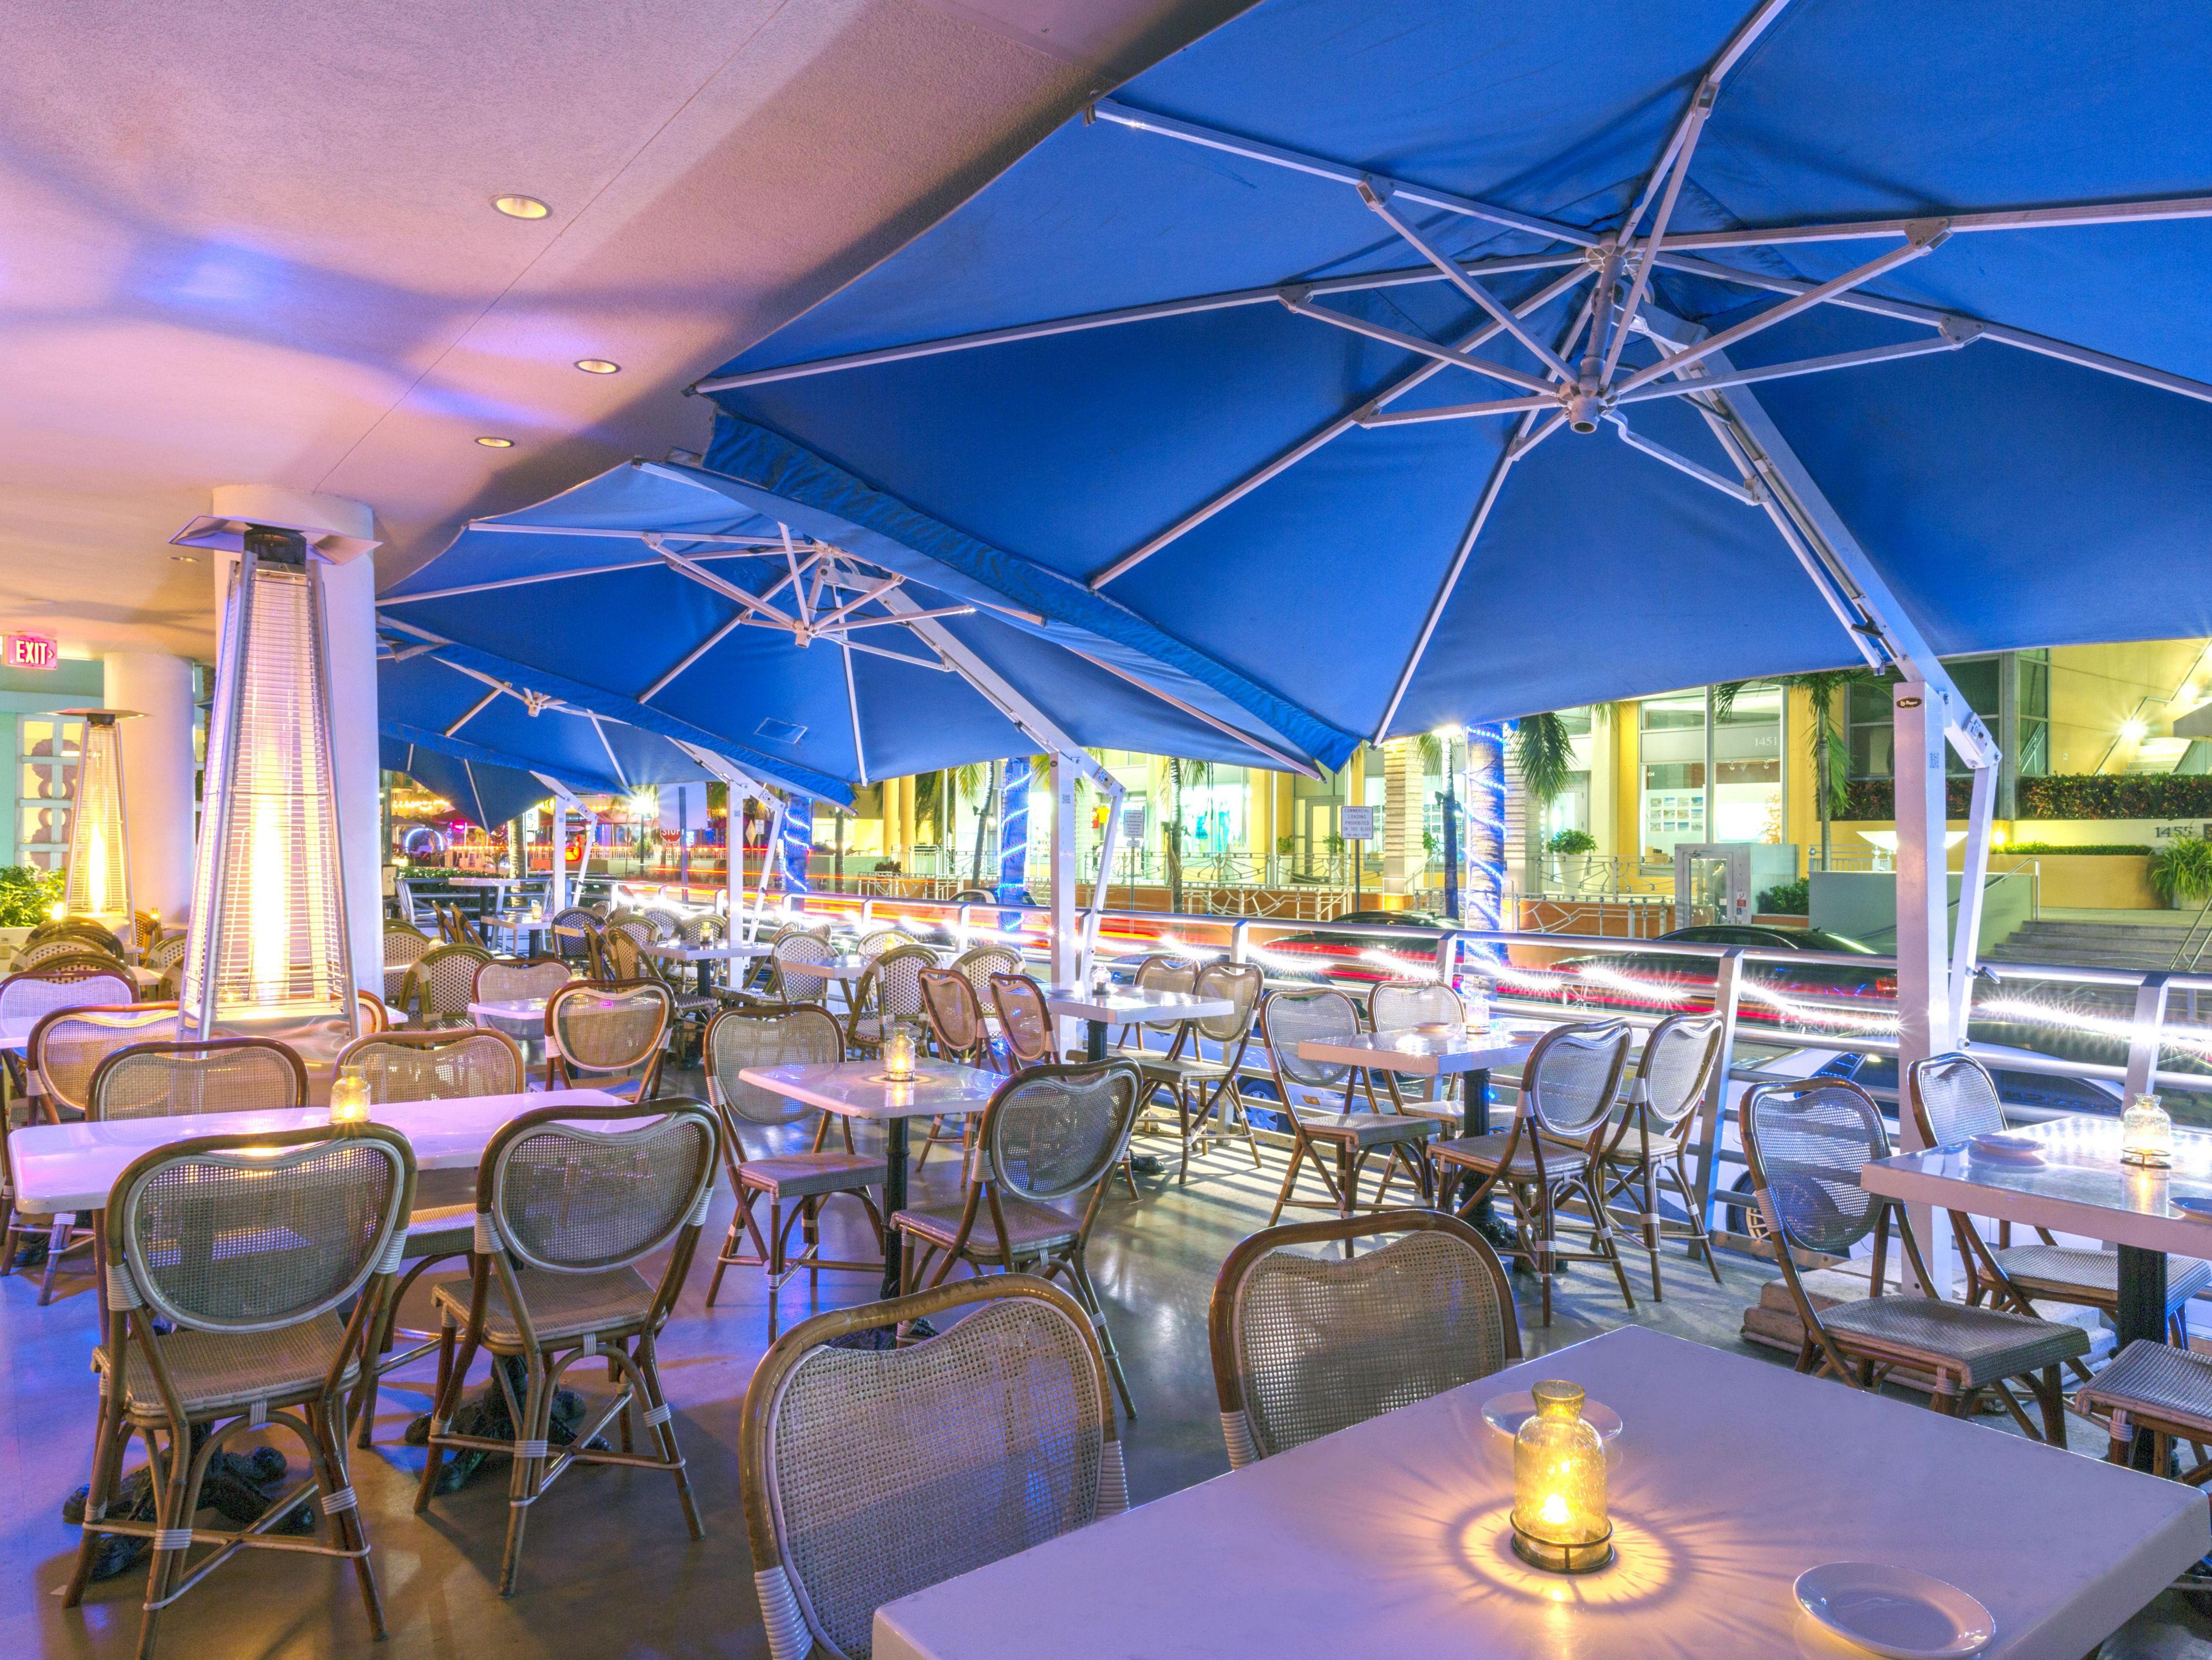 Restaurant Groupsandmeetingsphotos Vergaderruimte Ihg Crowneplaza Ponents